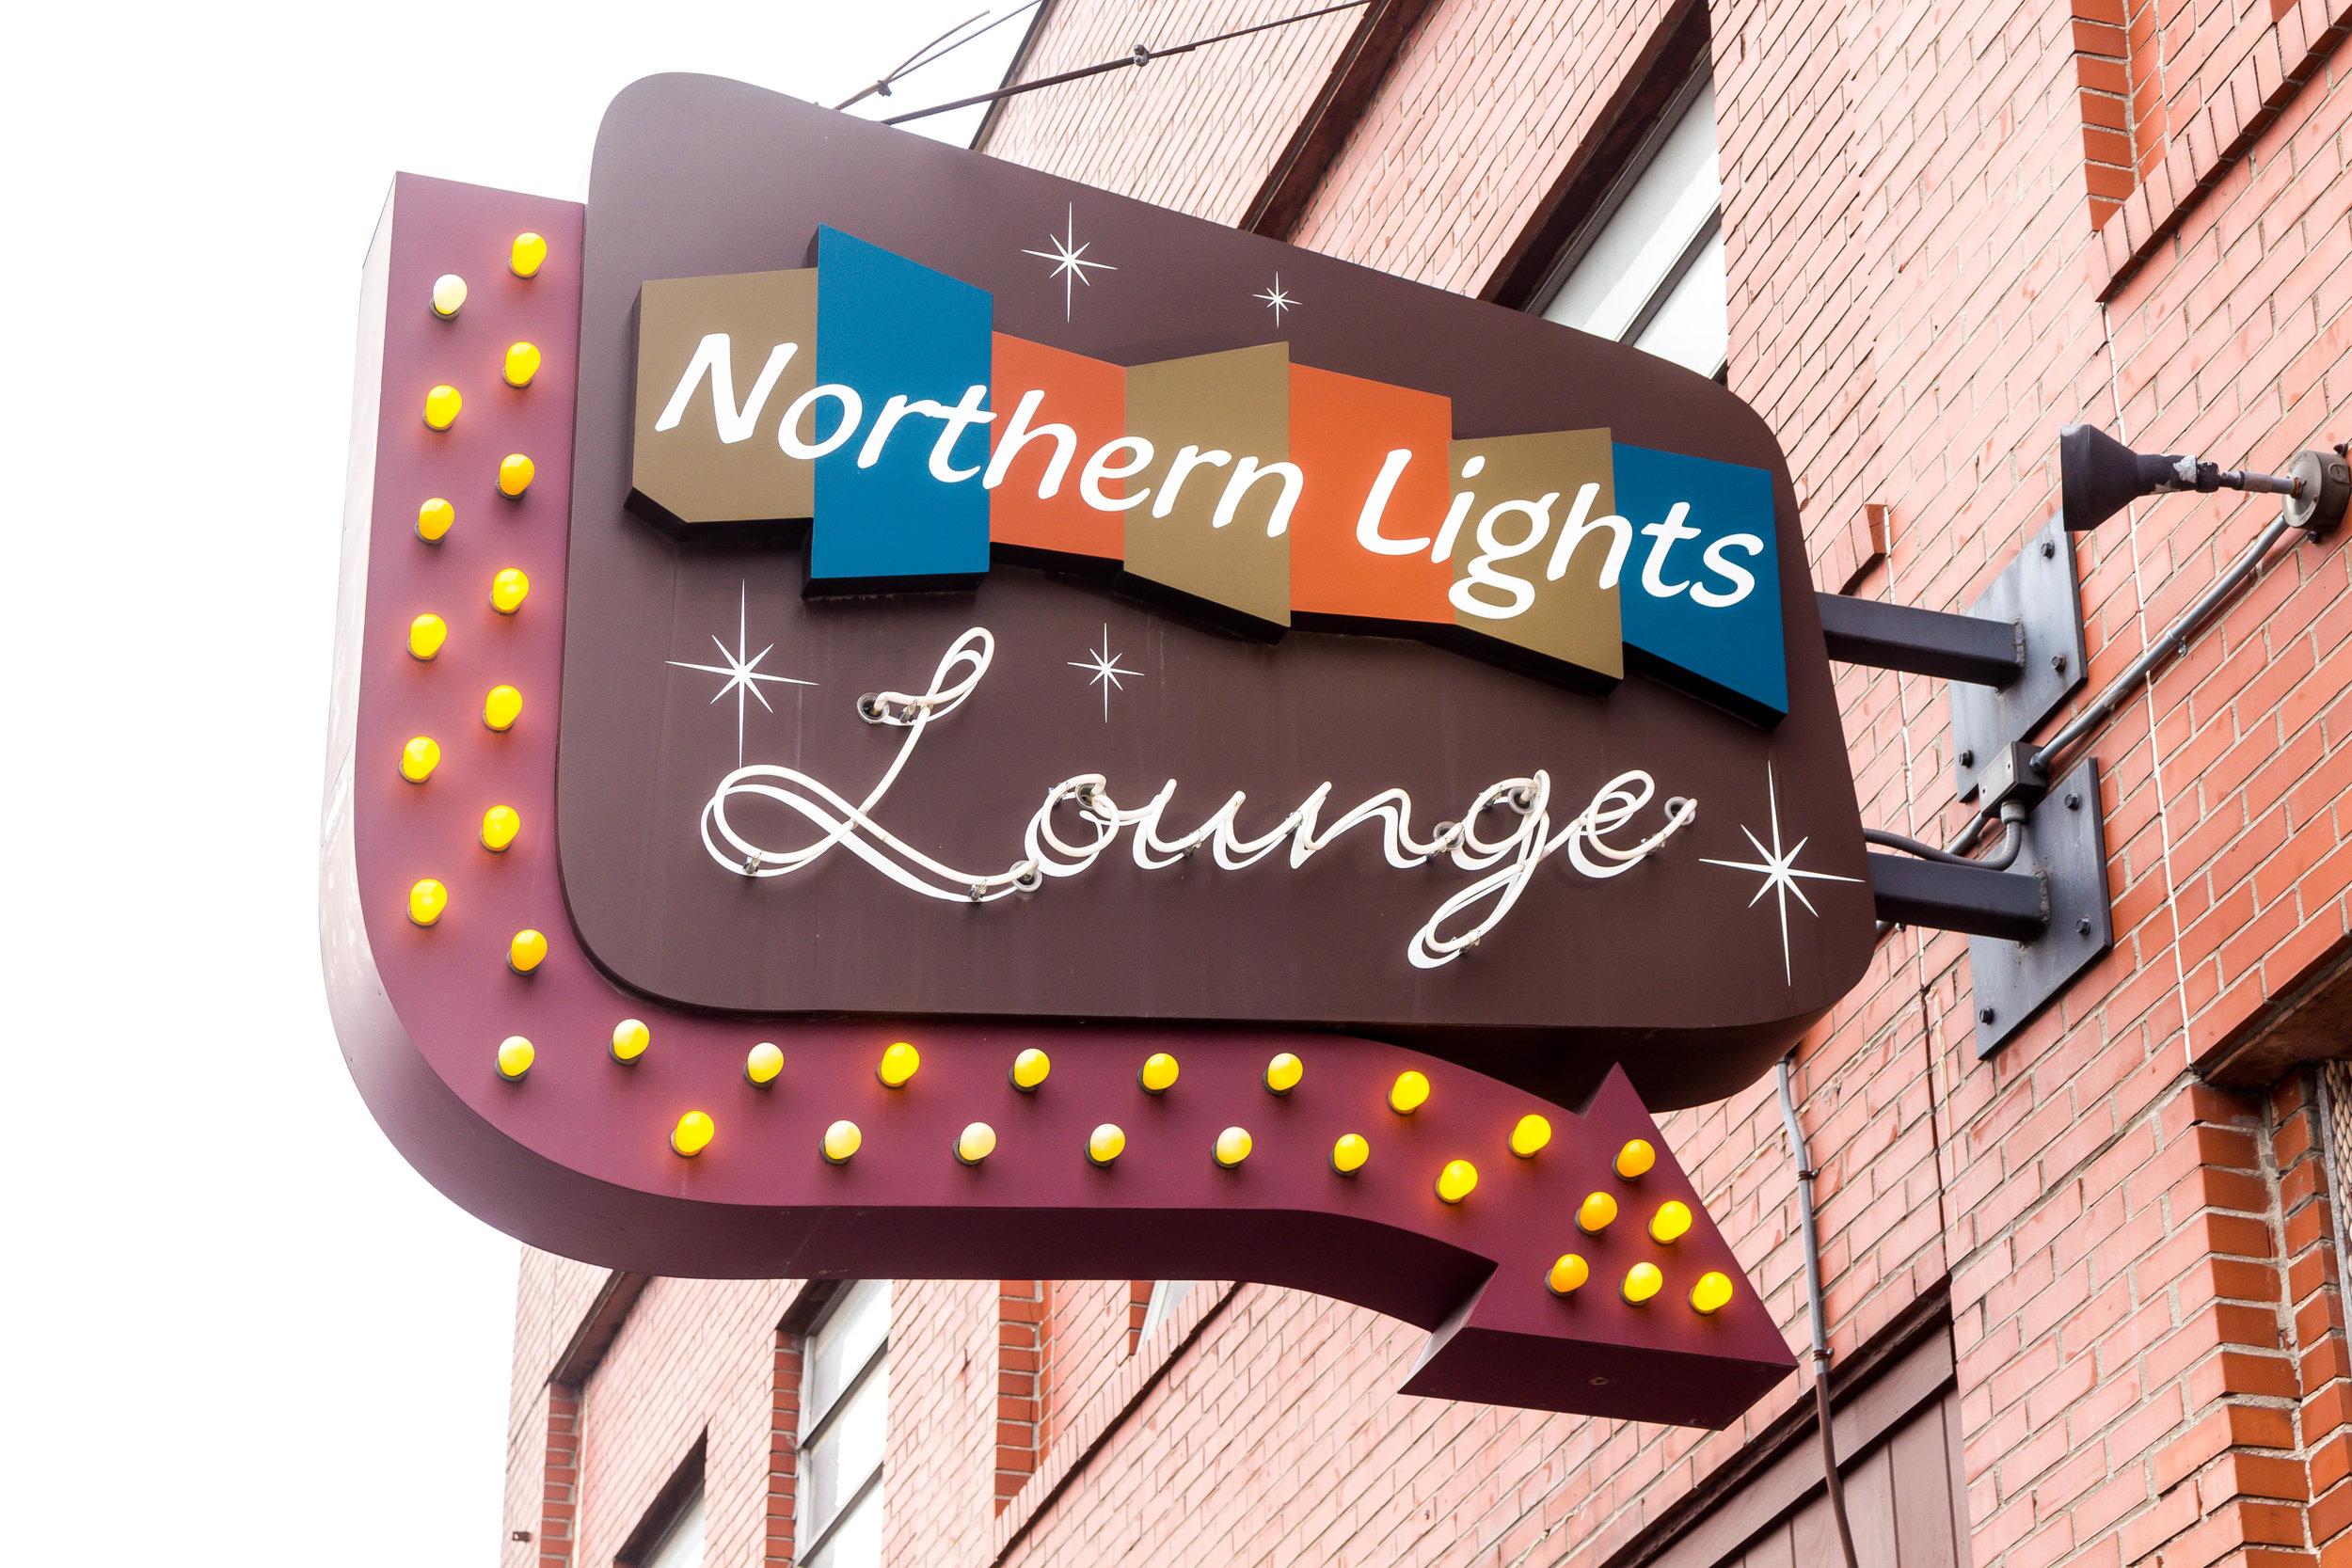 Northern Lights Lounge